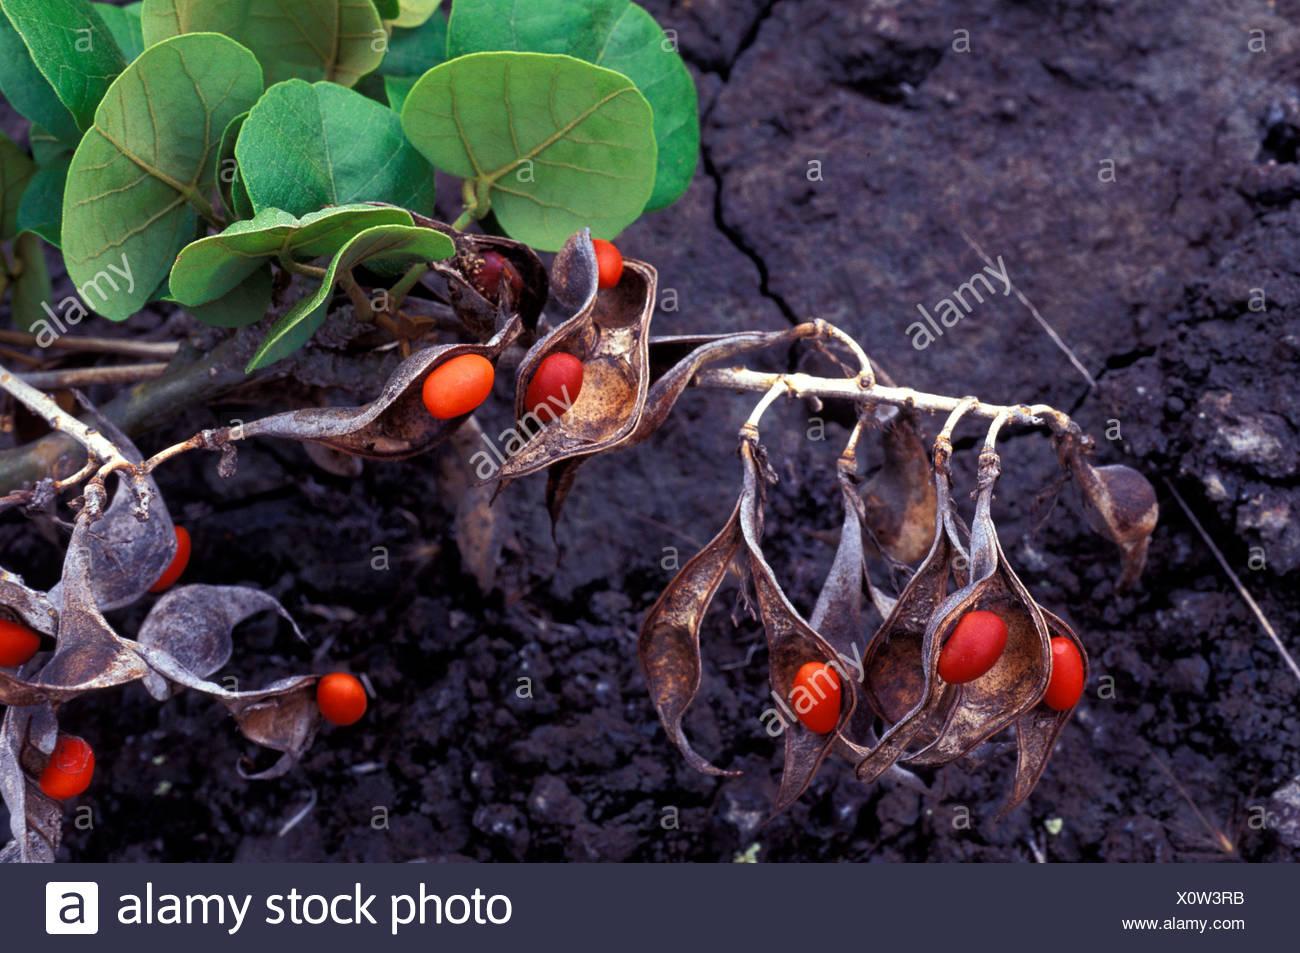 Wiliwili erythrina sandwicensis is a native hawaiian plant the wiliwili erythrina sandwicensis is a native hawaiian plant the seeds are used in making leis kaupulehu izmirmasajfo